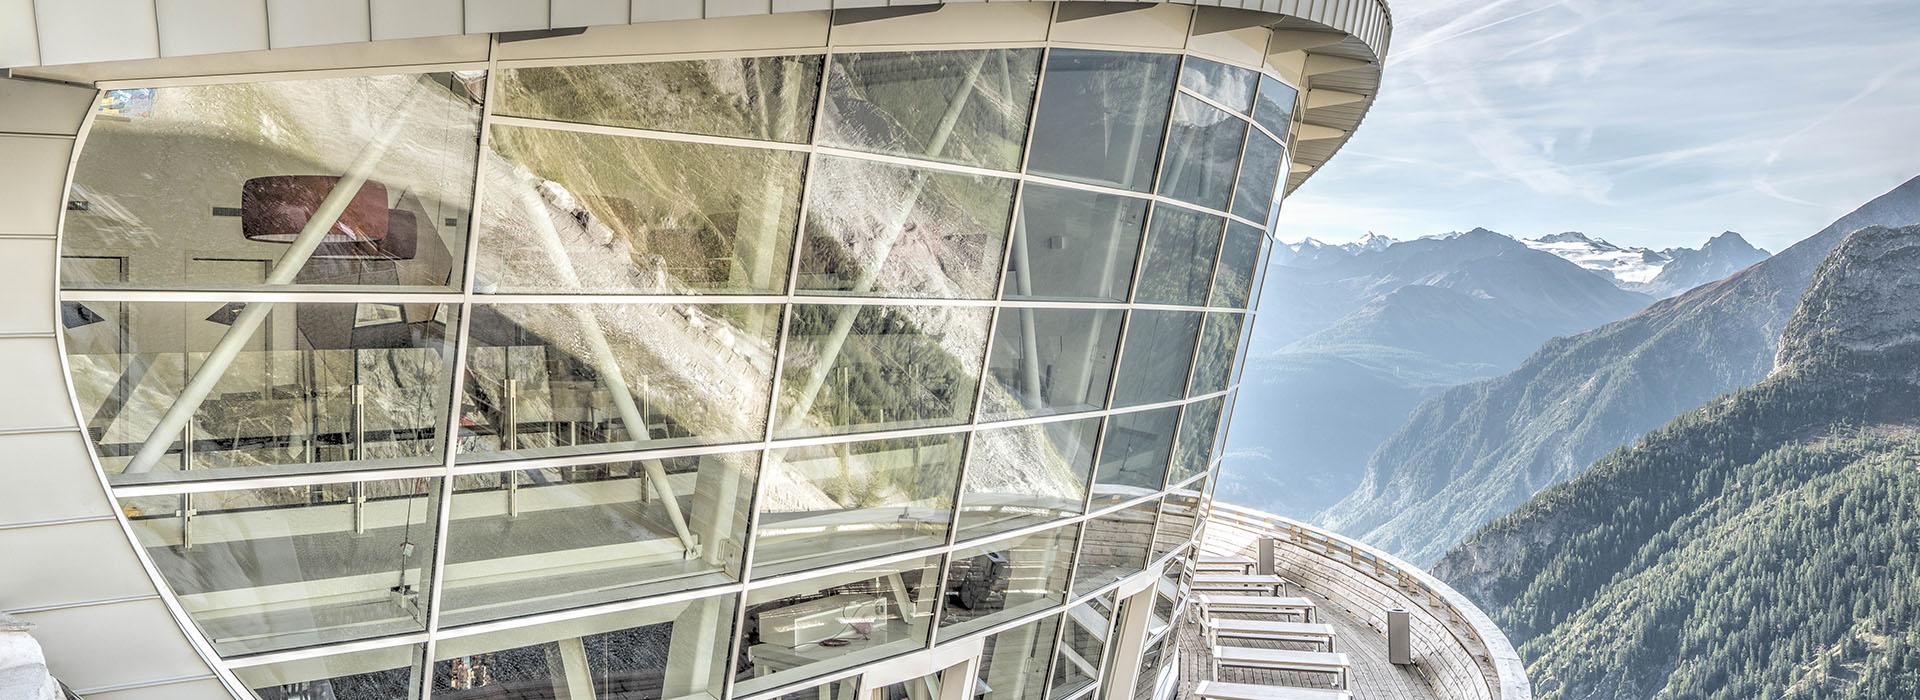 iplusmile 10 St/ück Hochtemperaturbest/ändiger Glasr/ührstab Experiment Glasstab Glasst/äbe f/ür Schullabor Experiment